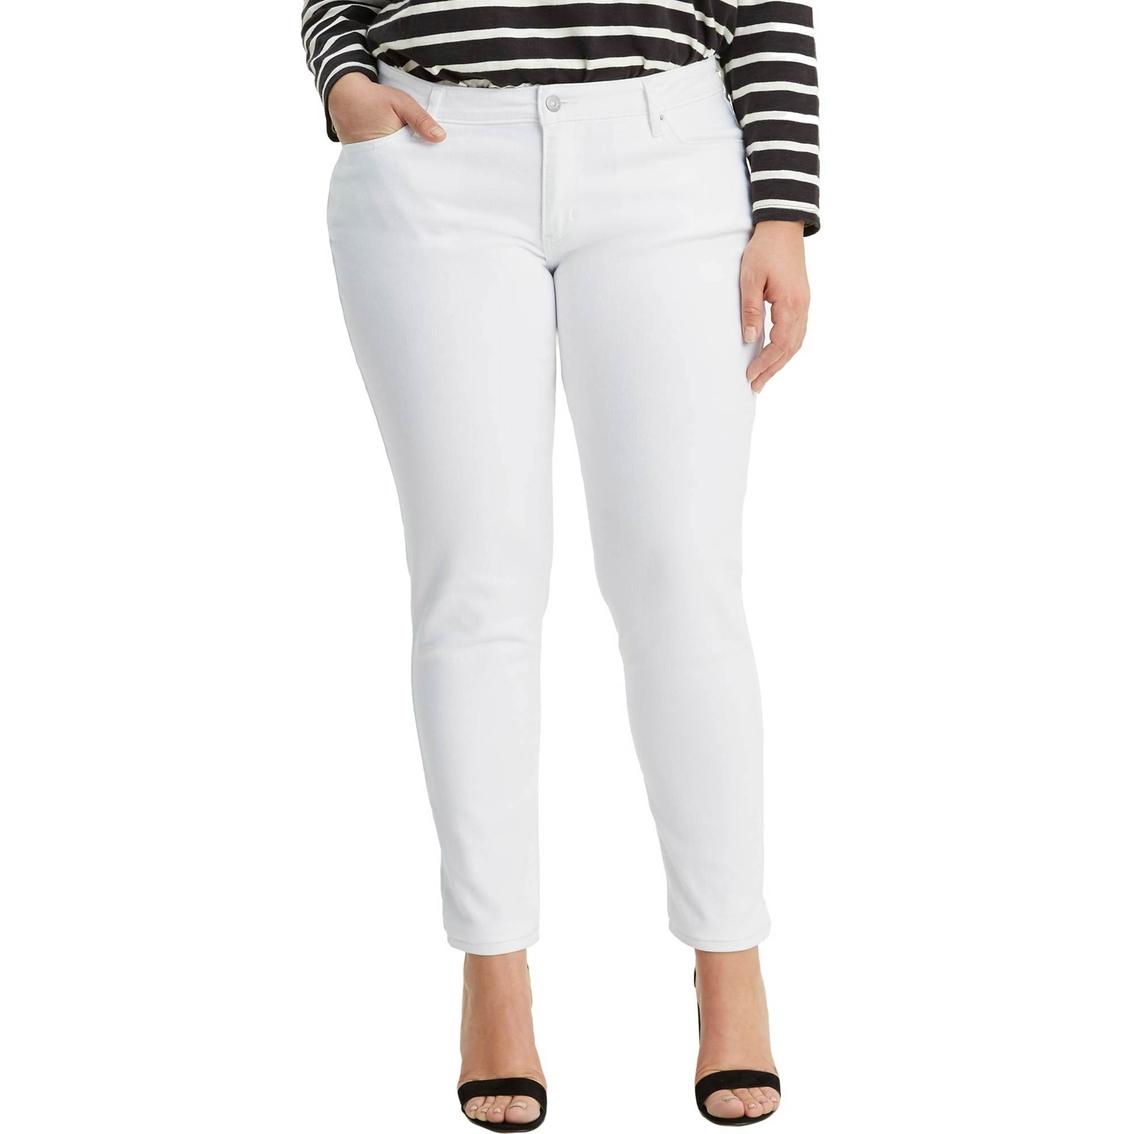 32a6a63f4e Levi s Plus Size 711 Skinny Jeans